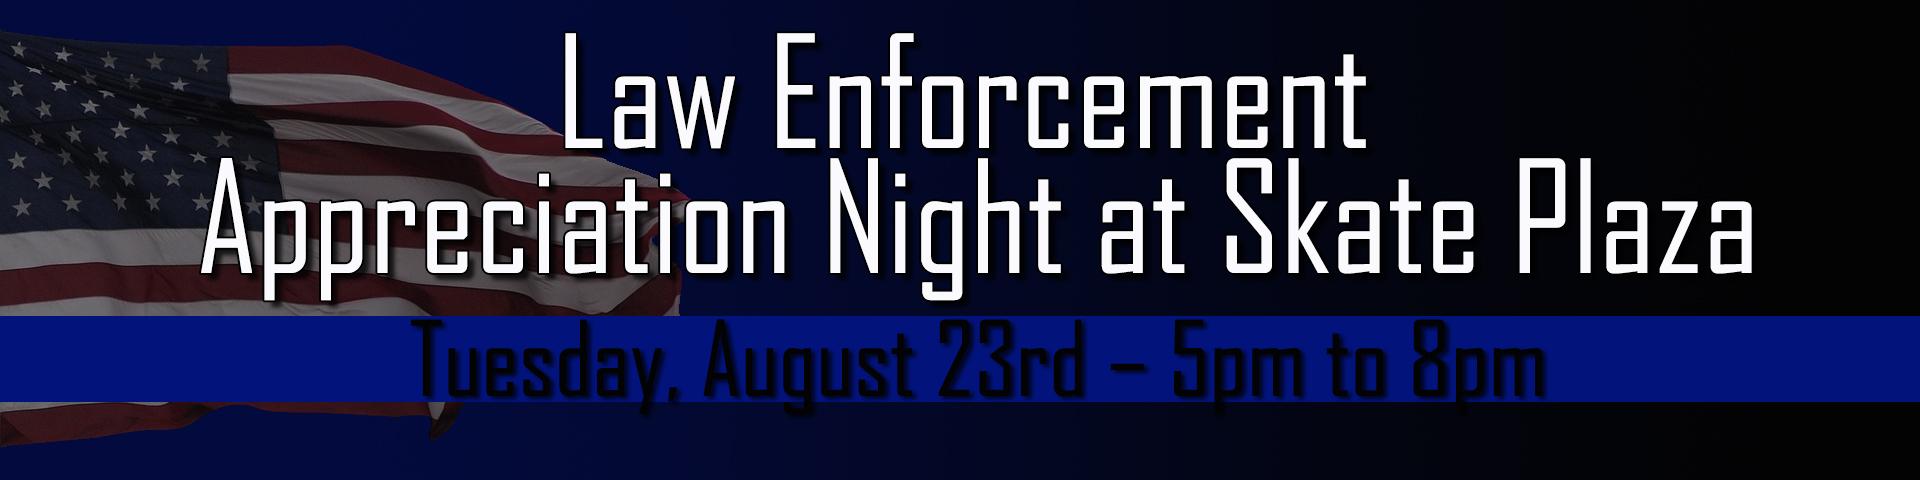 law-enforcement-night